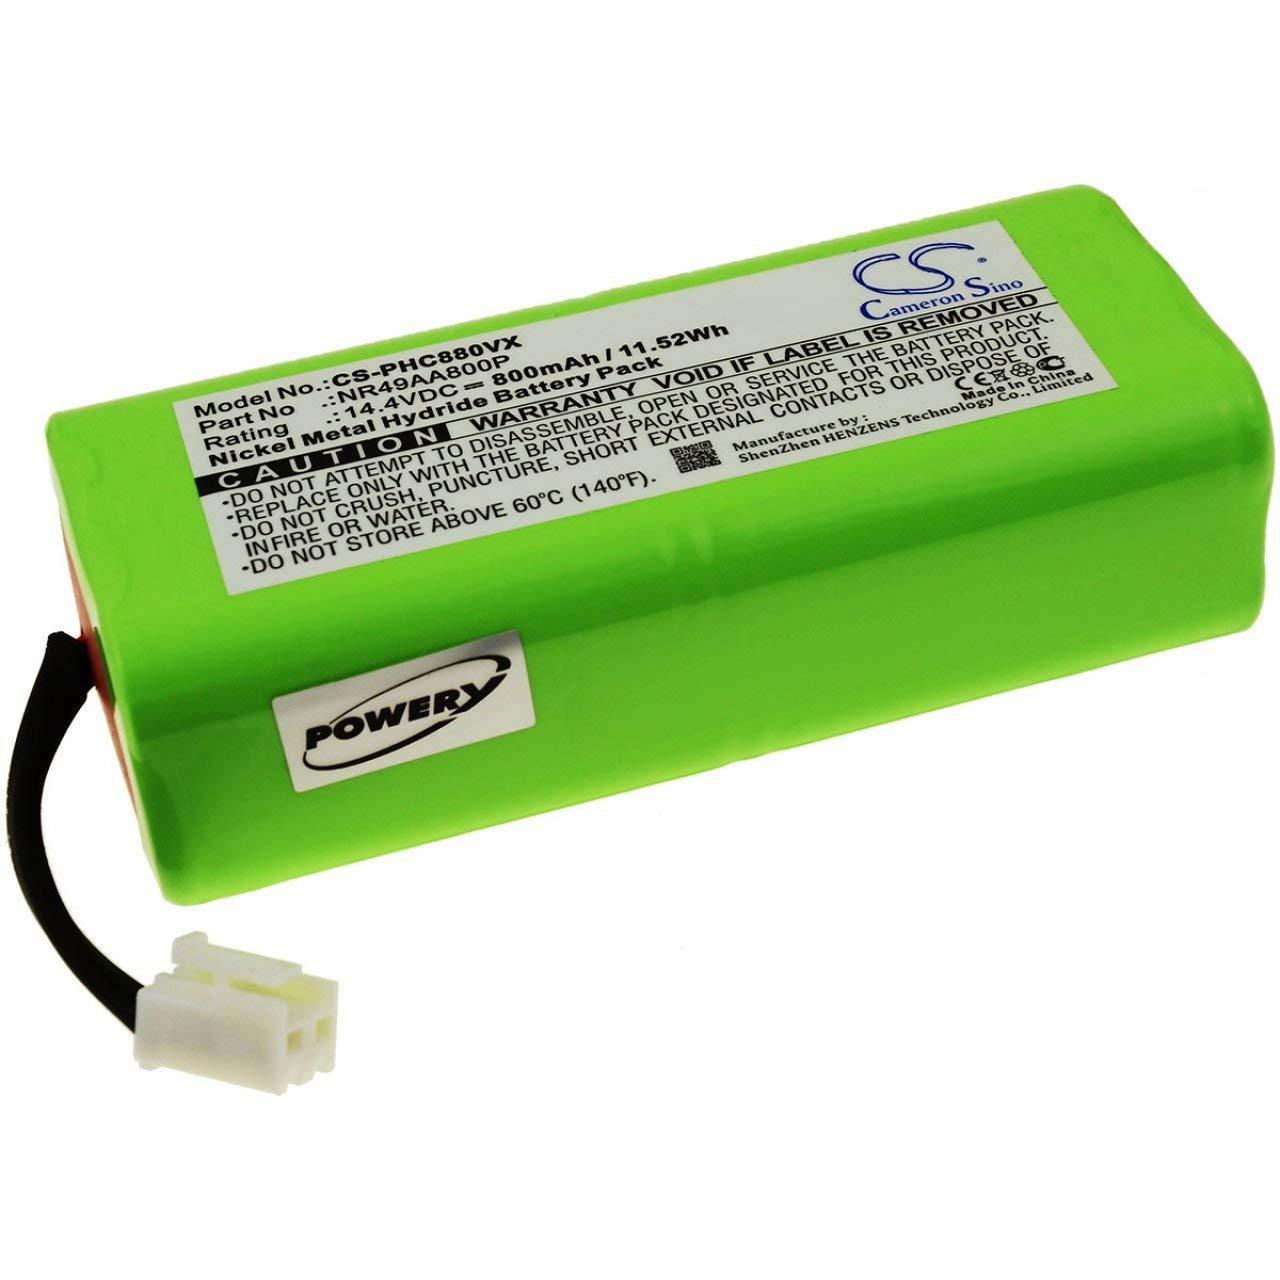 Powery Batería para Robot Aspirador Philips FC8800: Amazon.es ...